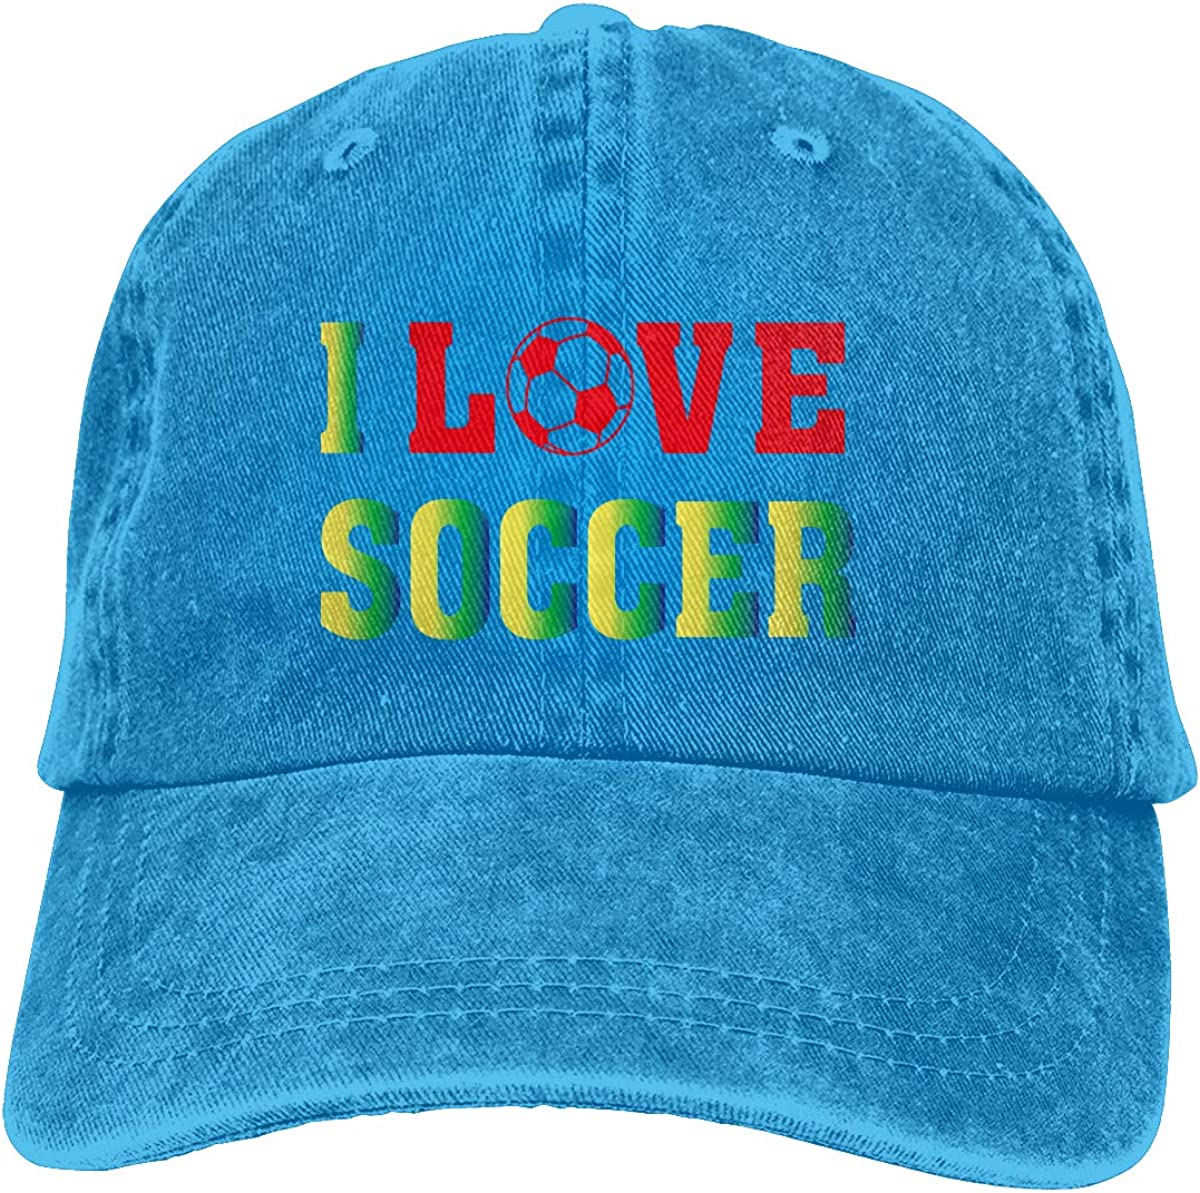 I Love Soccer Unisex Trendy Cowboy Casquette Adjustable Baseball Cap